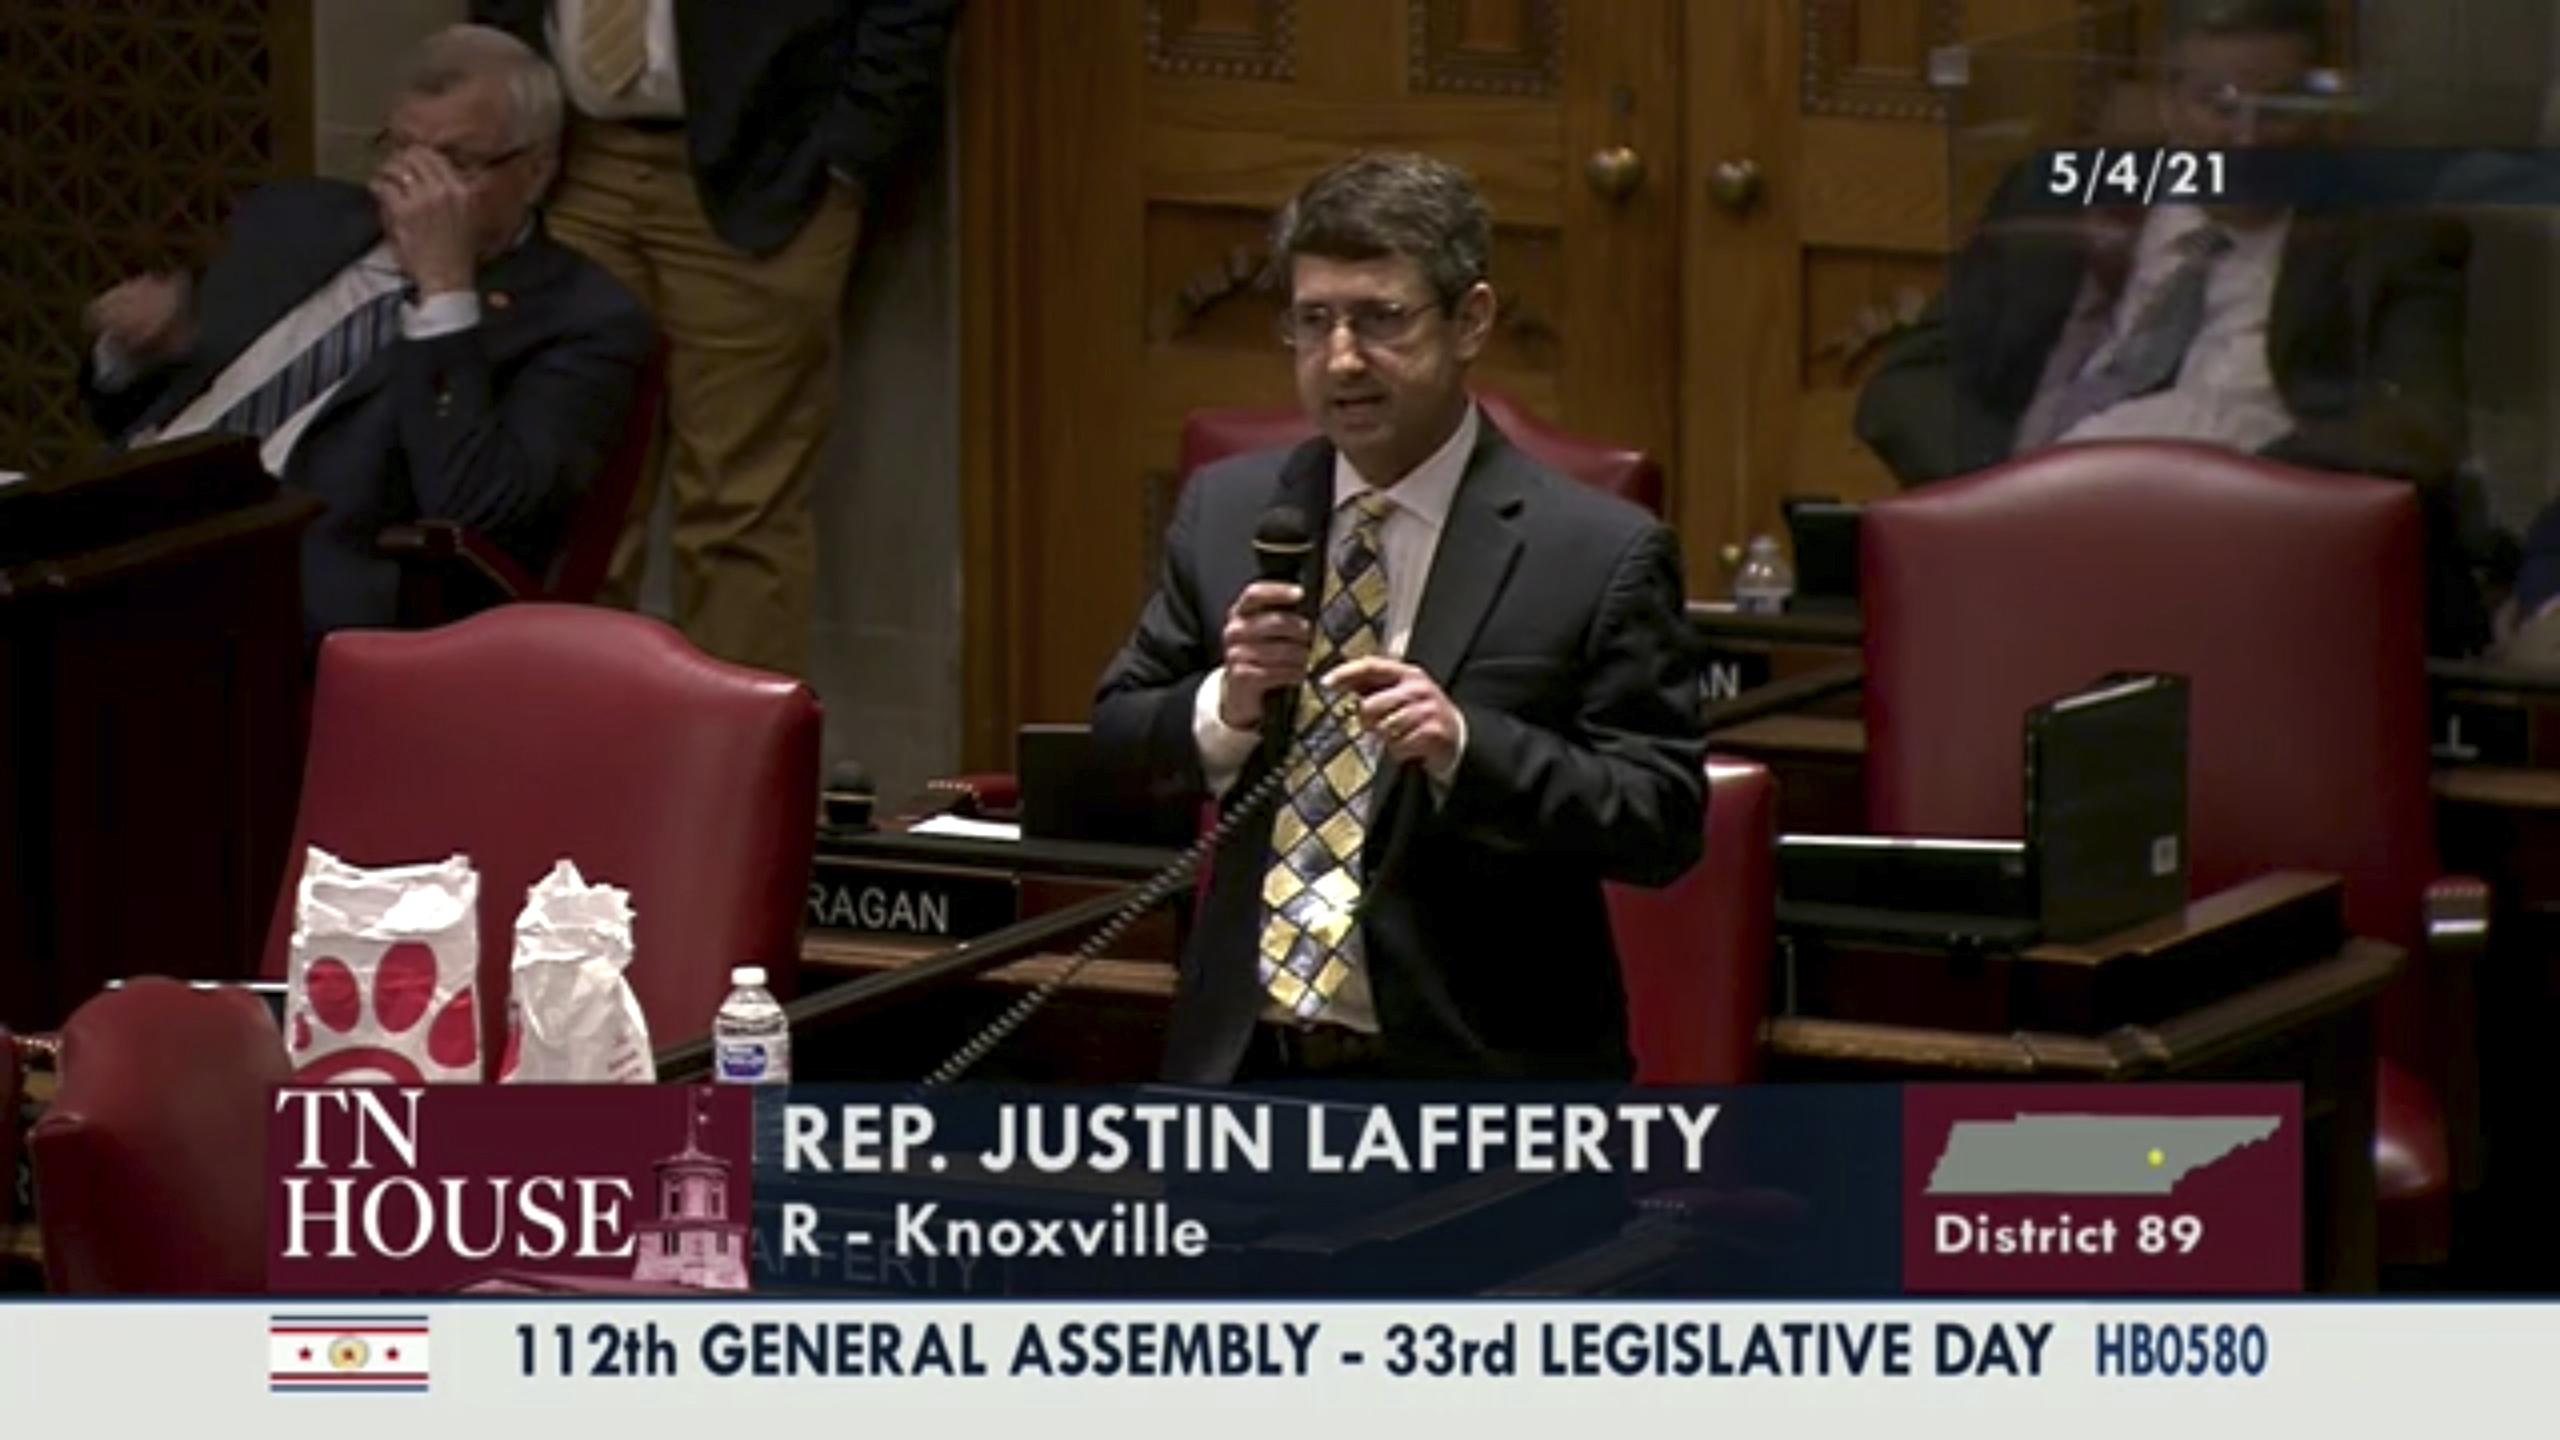 Justin Lafferty